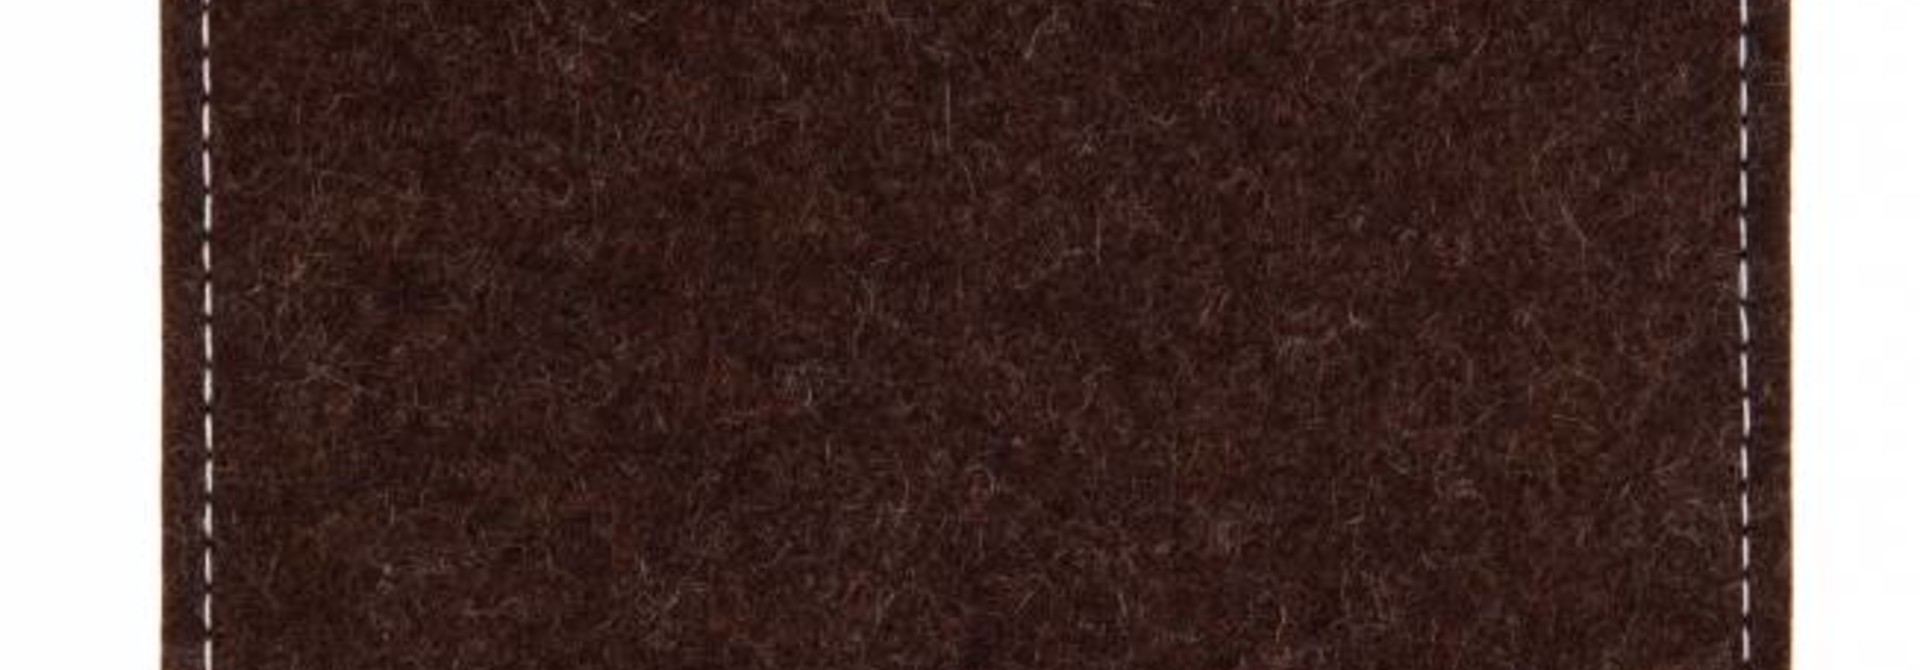 Galaxy Tablet Sleeve Truffle-Brown